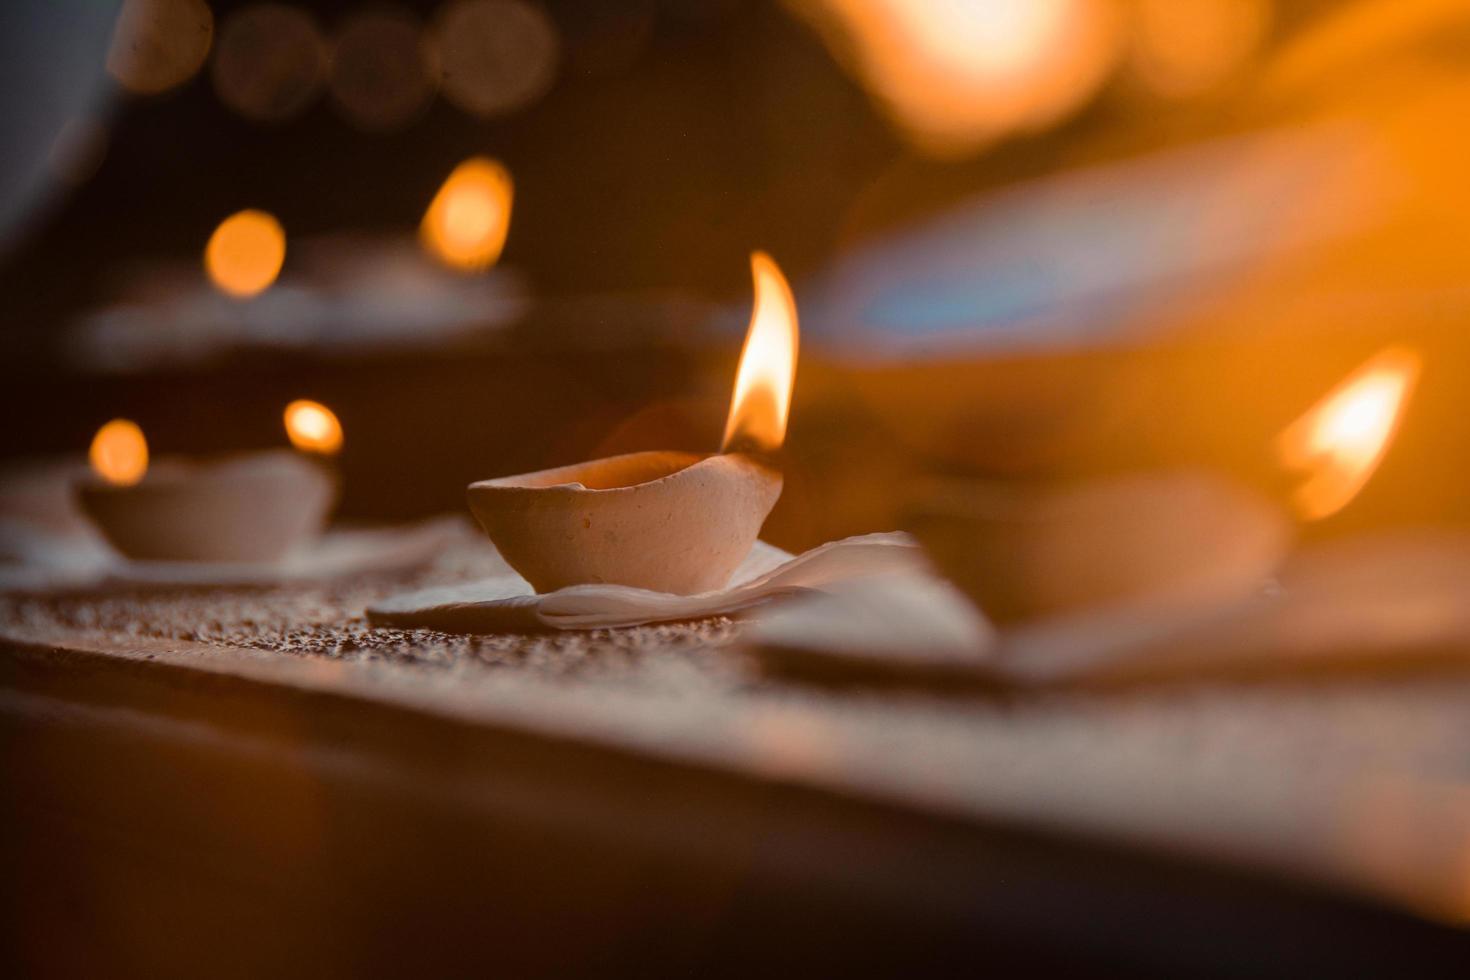 velas encendidas encendidas foto